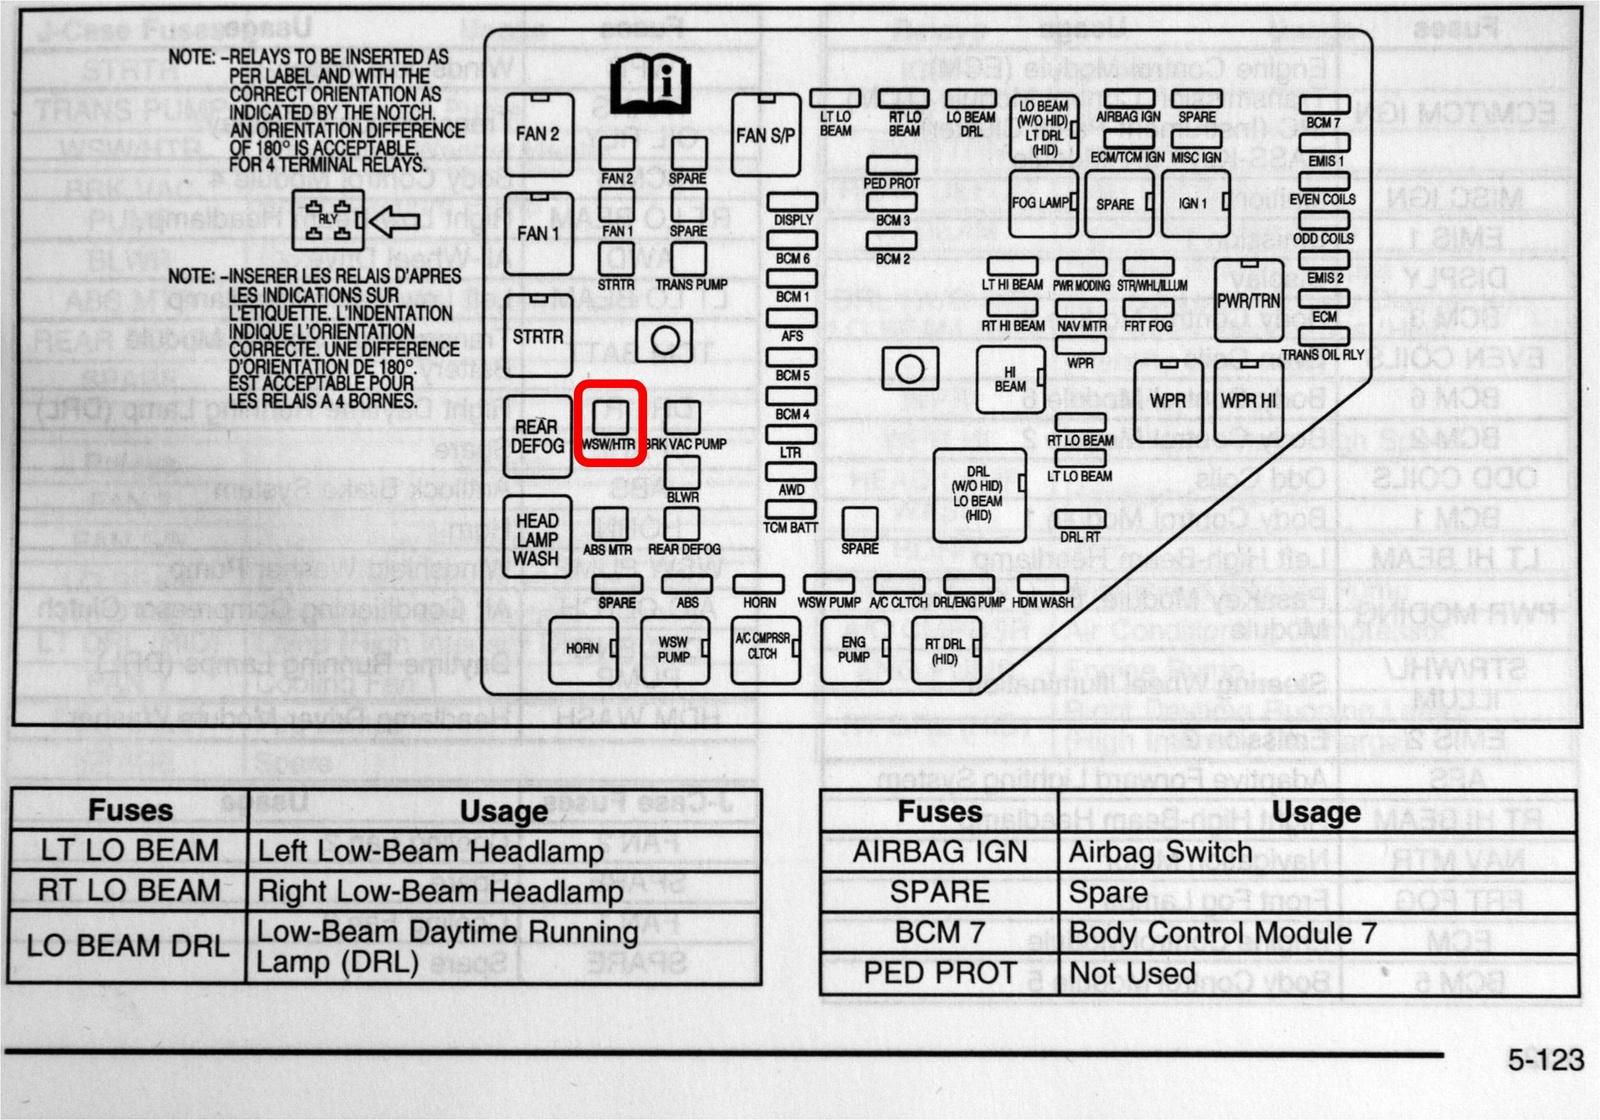 hight resolution of 2013 camaro fuse box locations autos post 1990 camaro fuse box location 2012 camaro fuse box